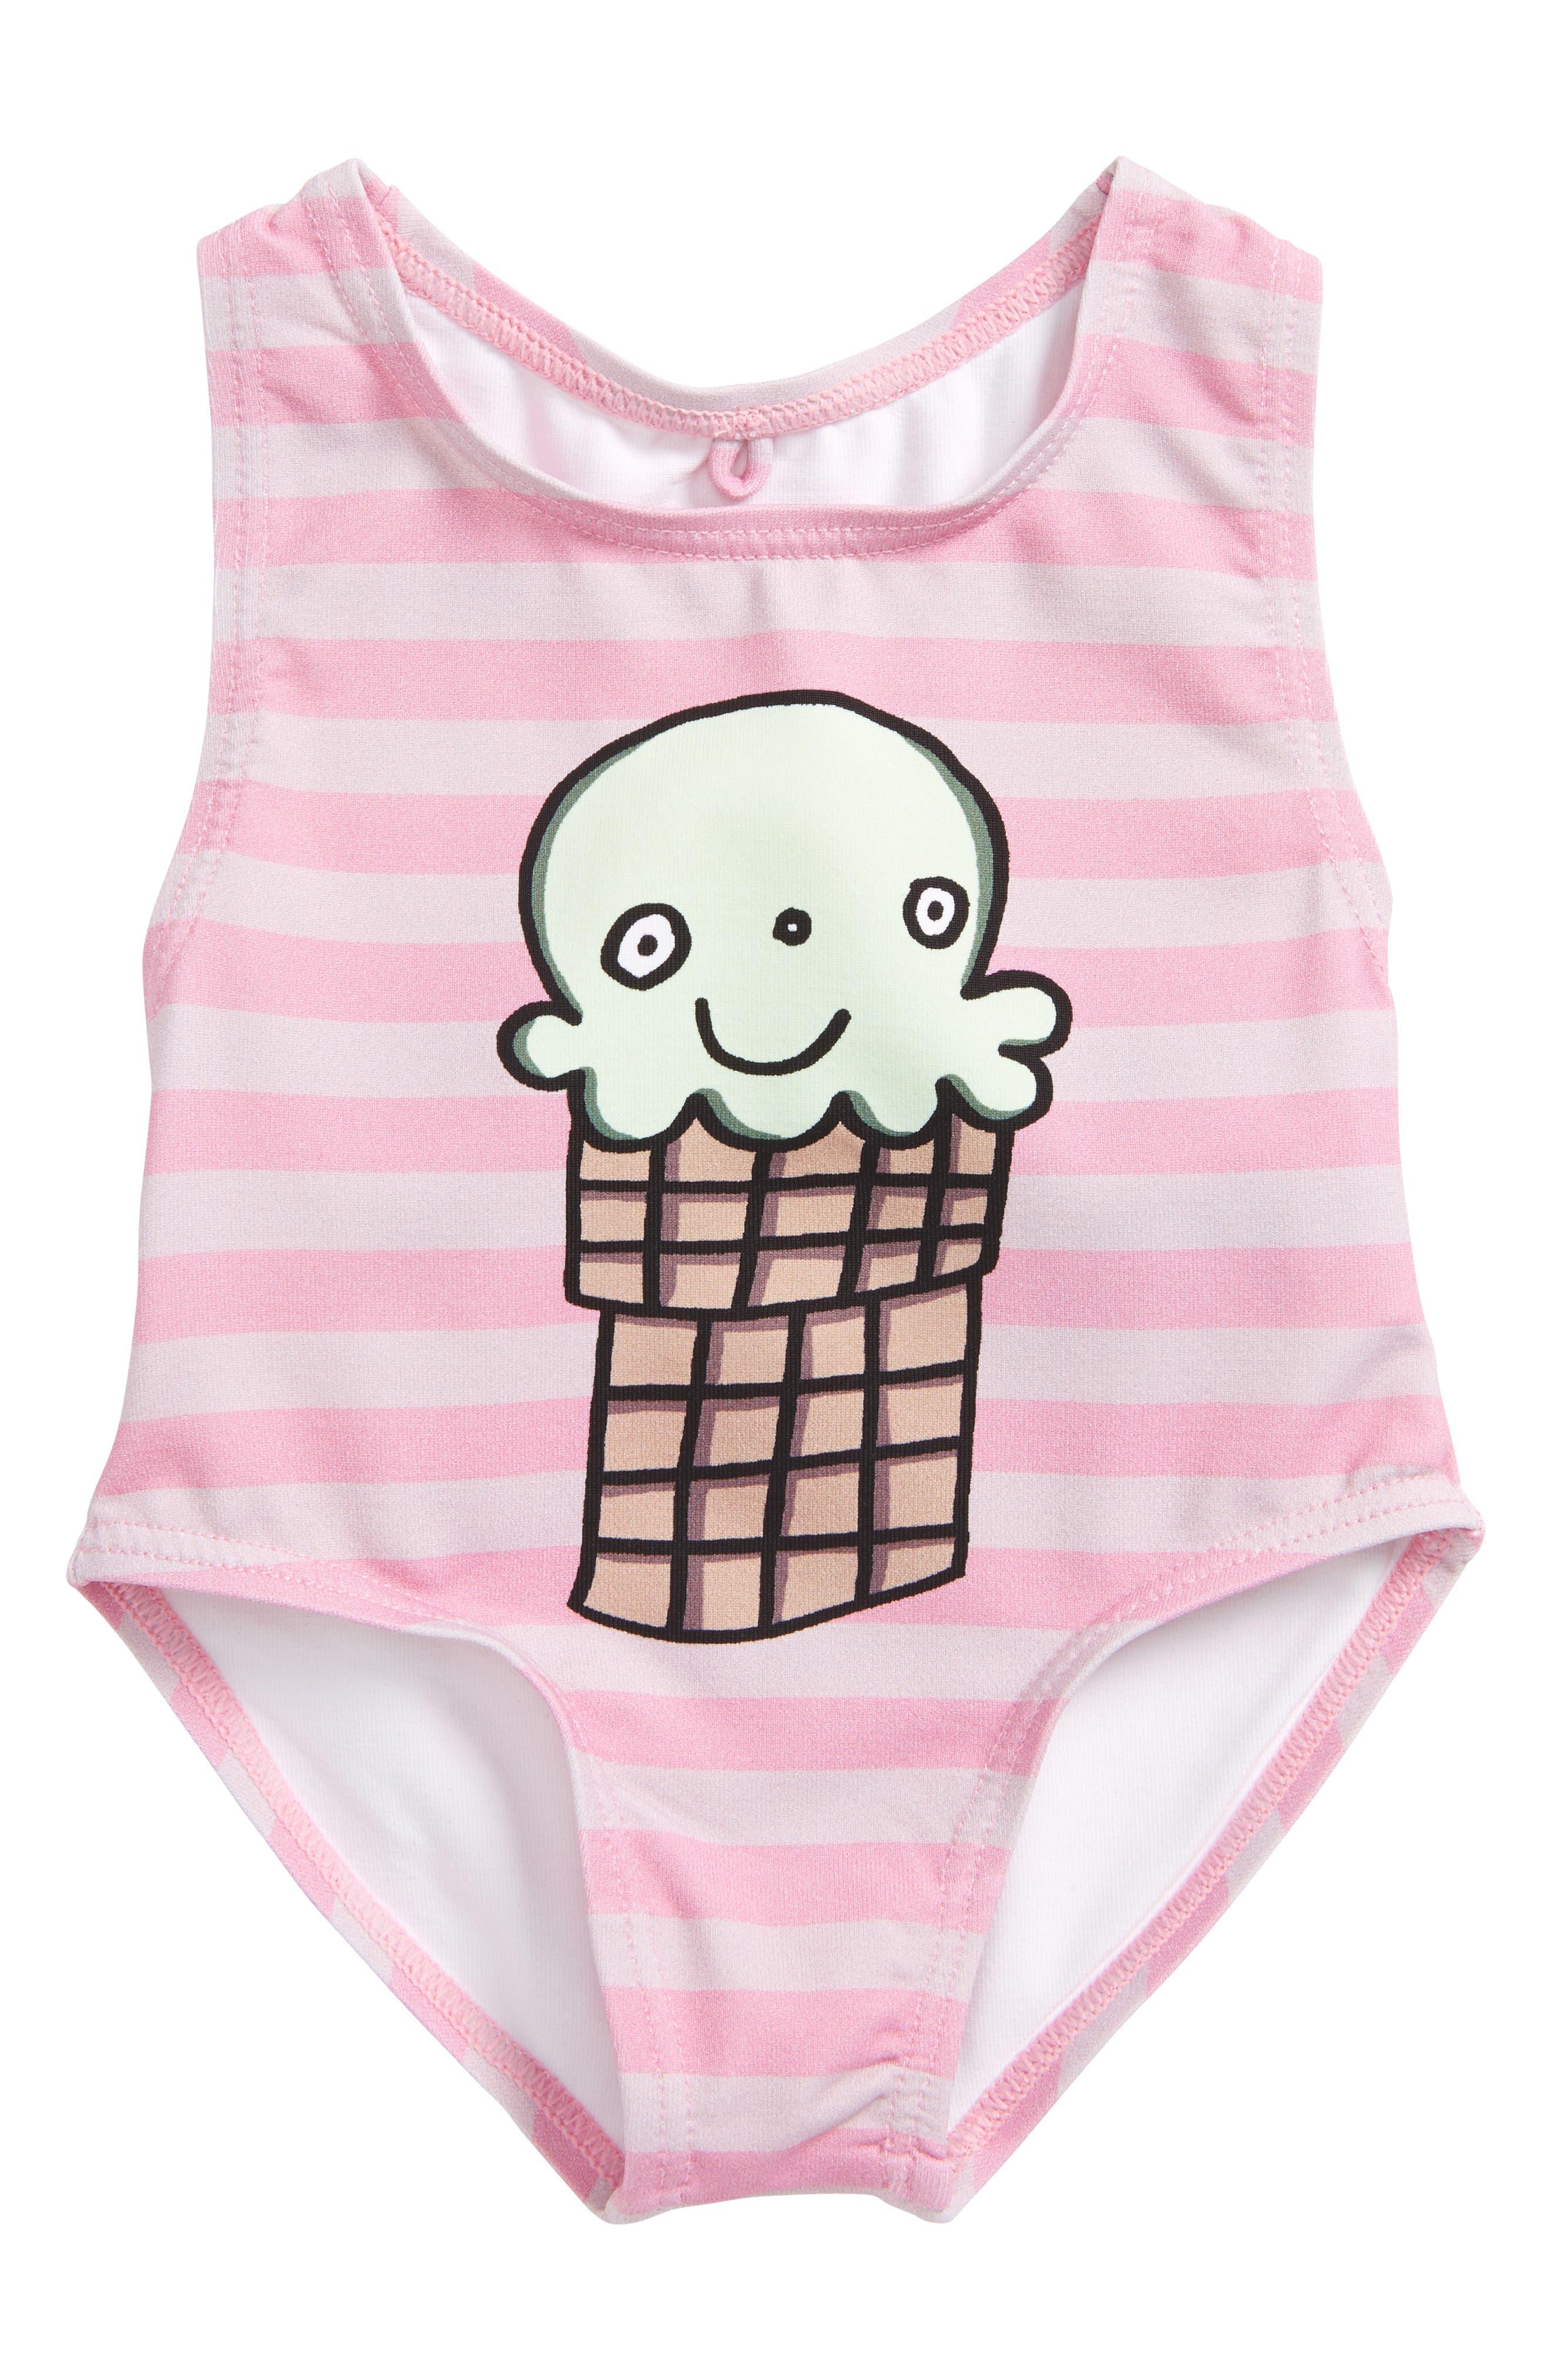 Main Image - Stella McCartney Molly Ice Cream One-Piece Swimsuit (Baby Girls)